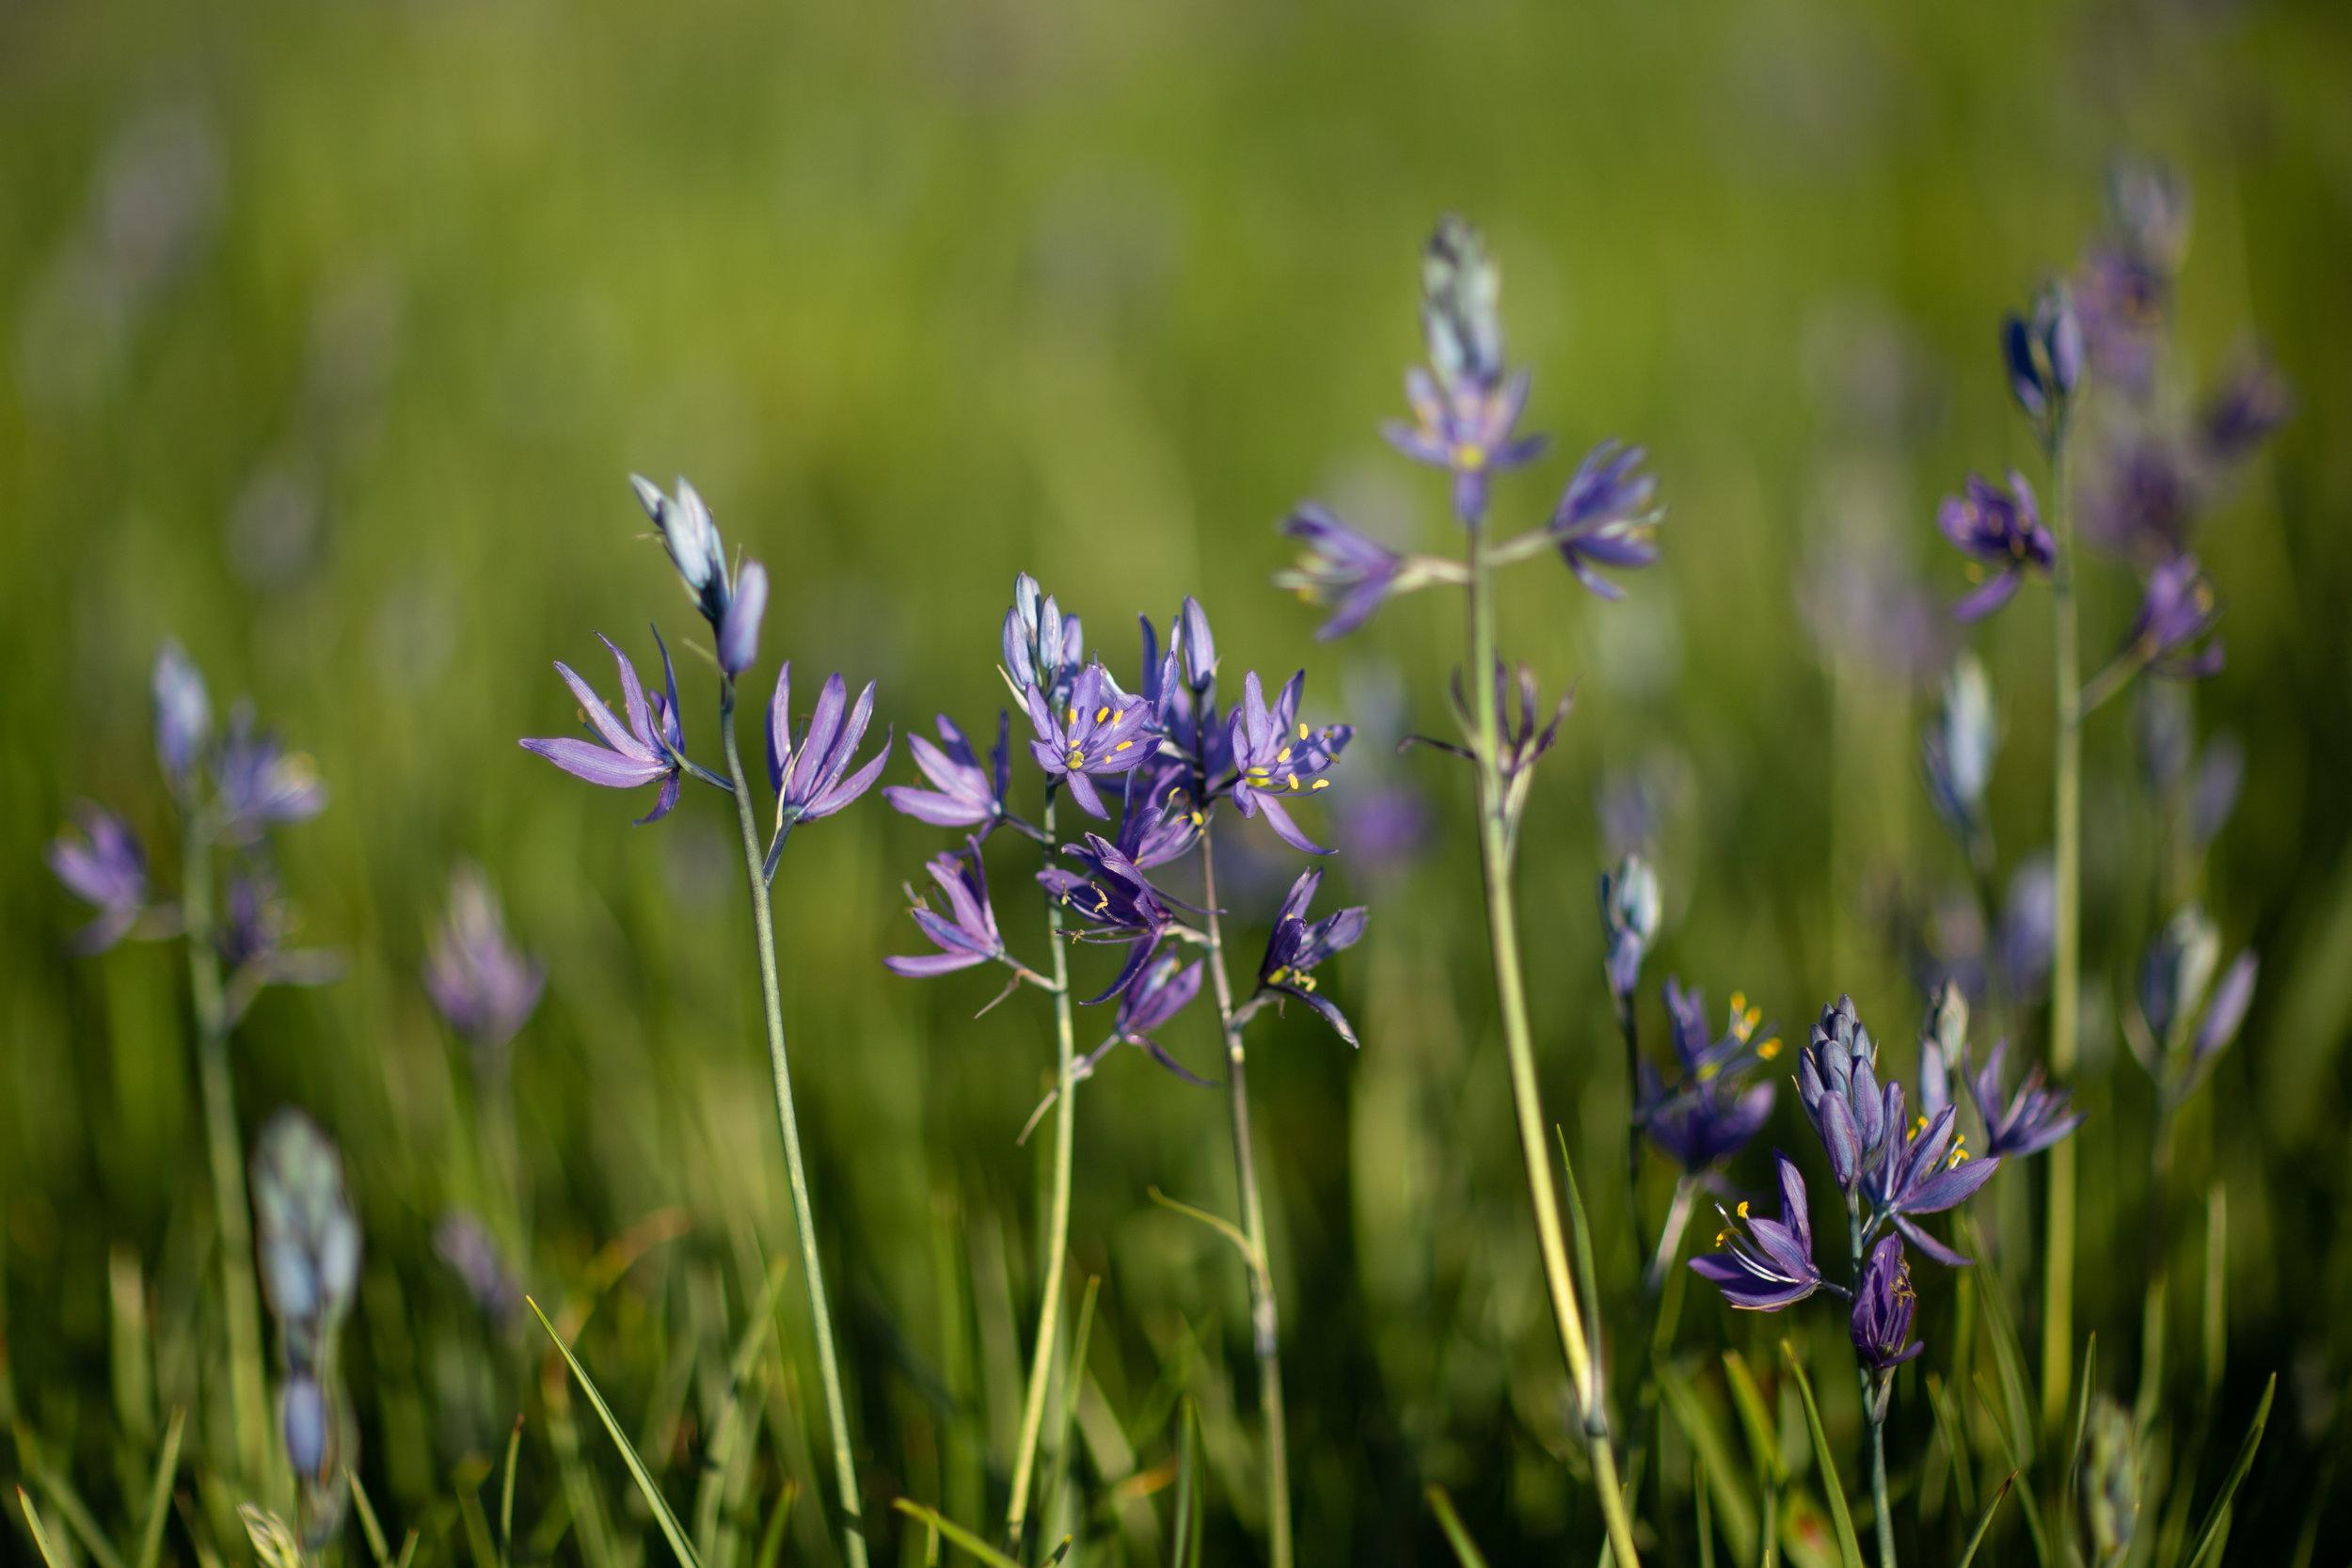 Camas lilies